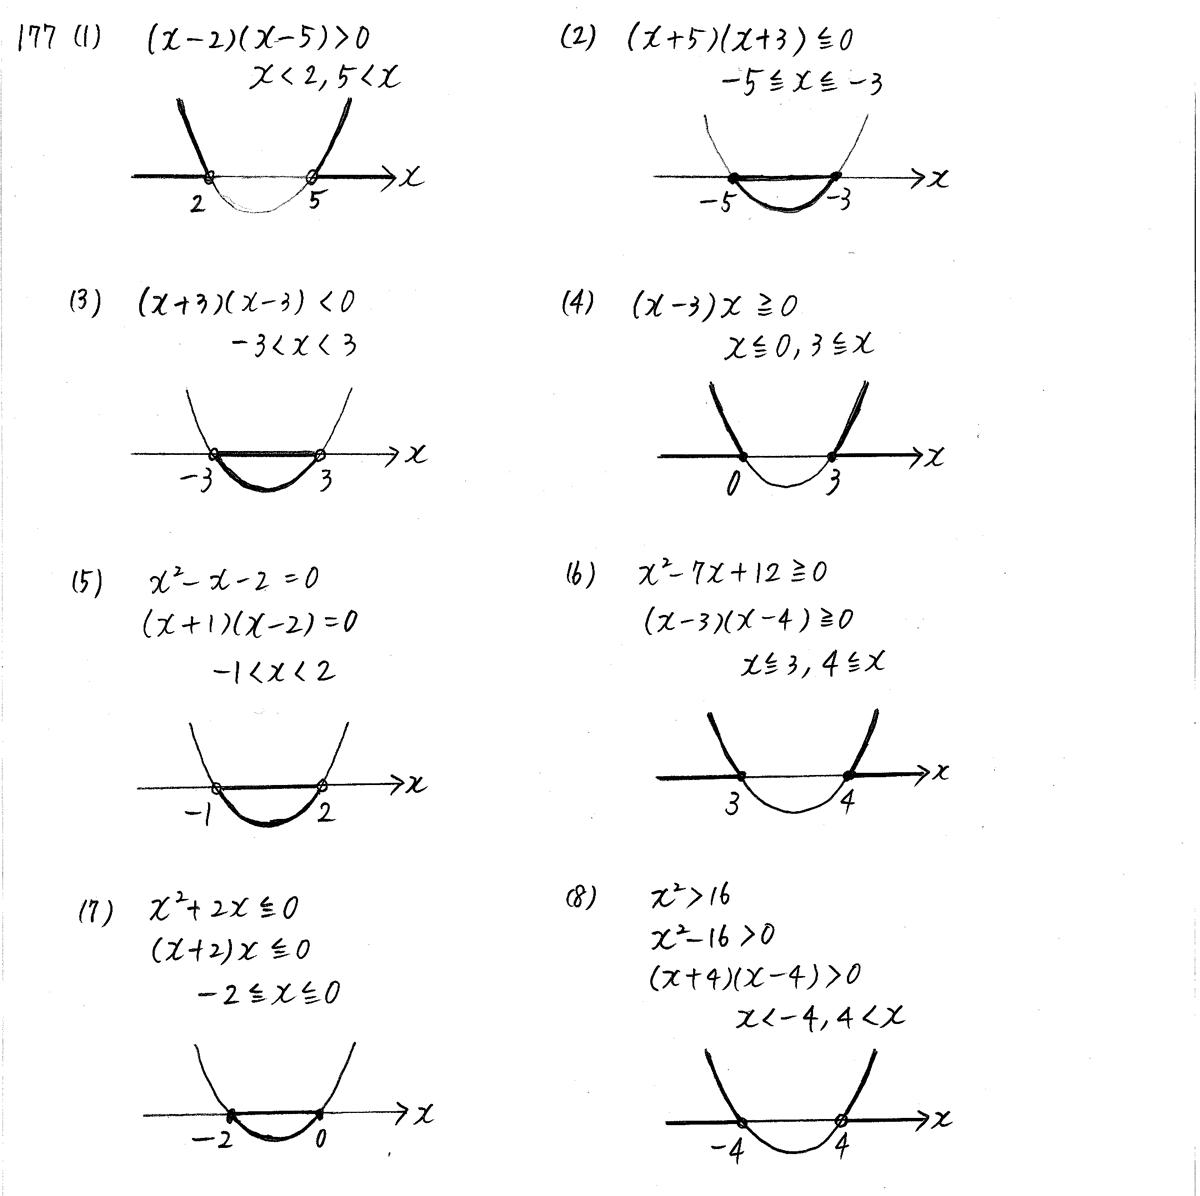 3TRIAL数学1-177解答